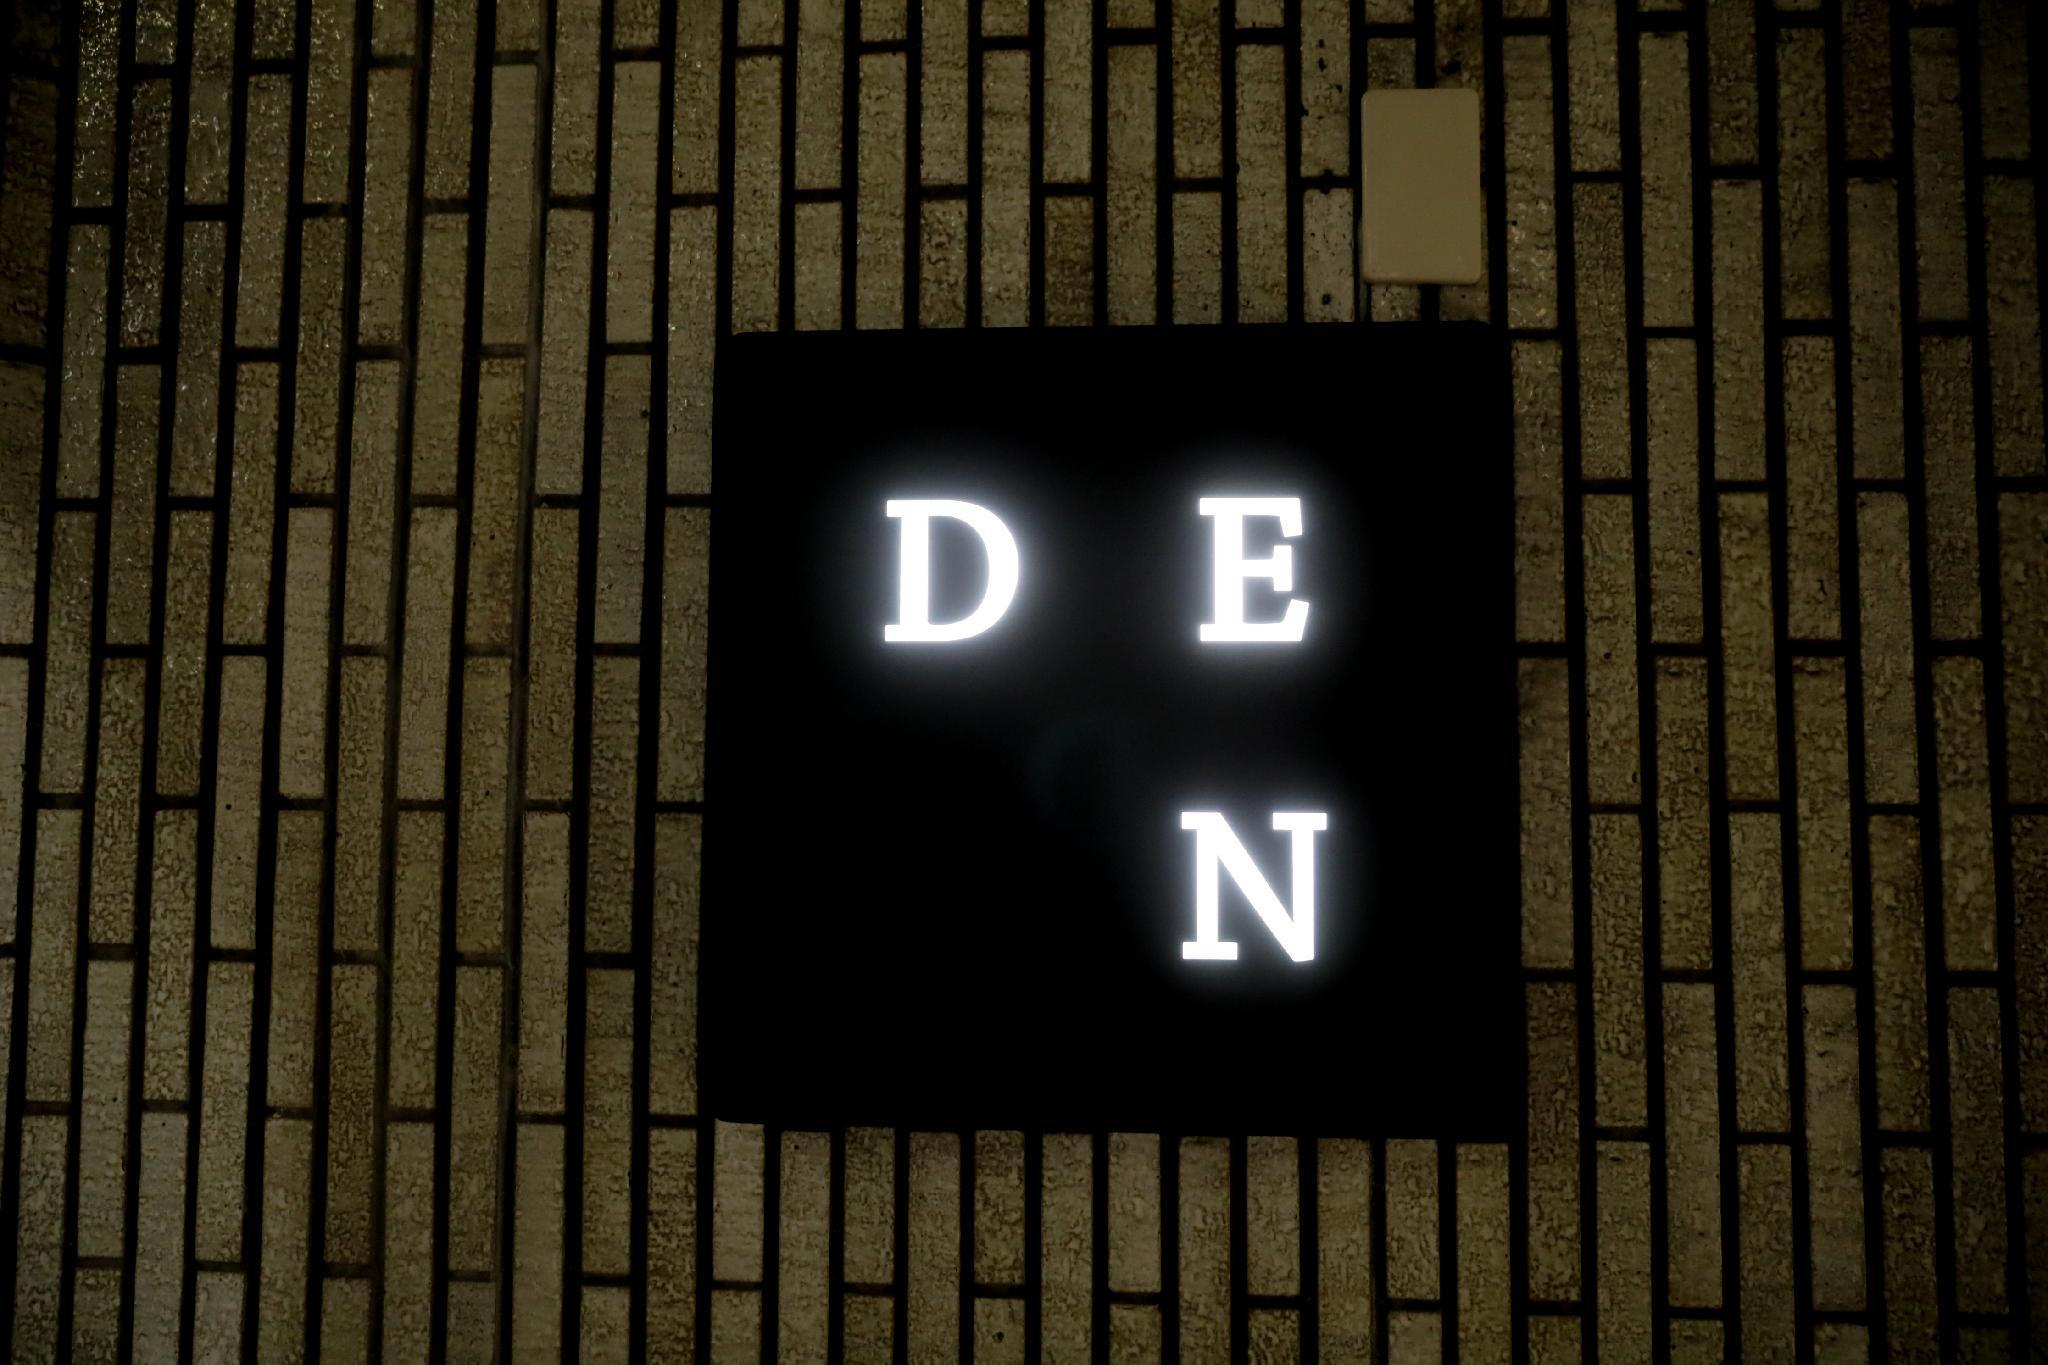 hostel DEN, Chiyoda